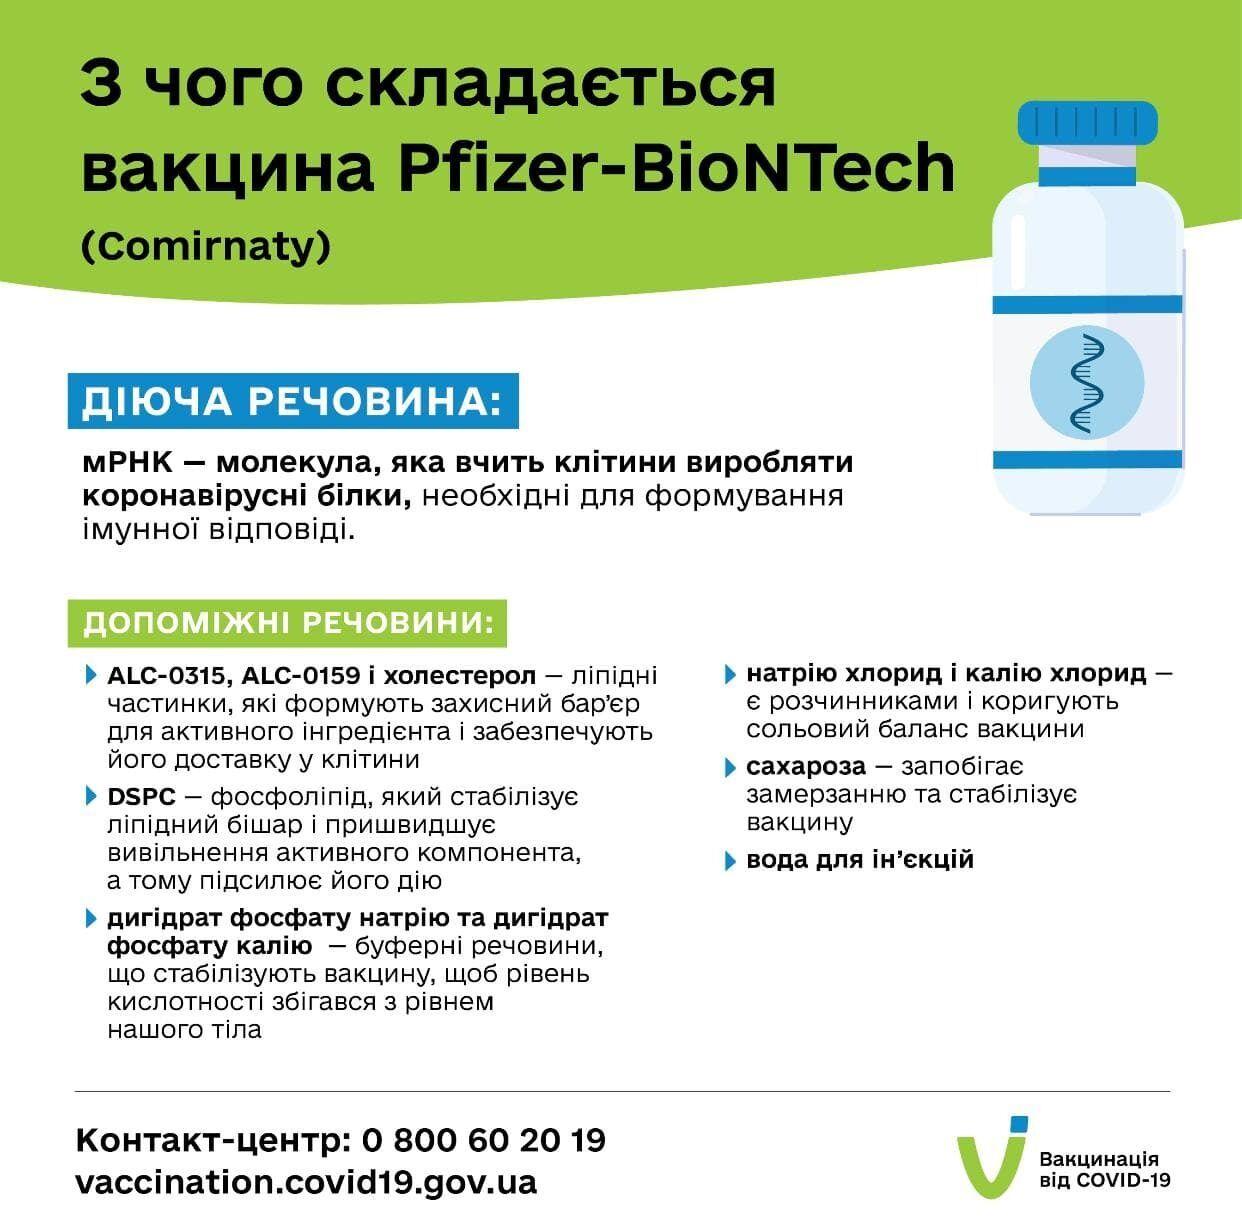 Склад вакцини Pfizer&BioNTech (Comirnaty)